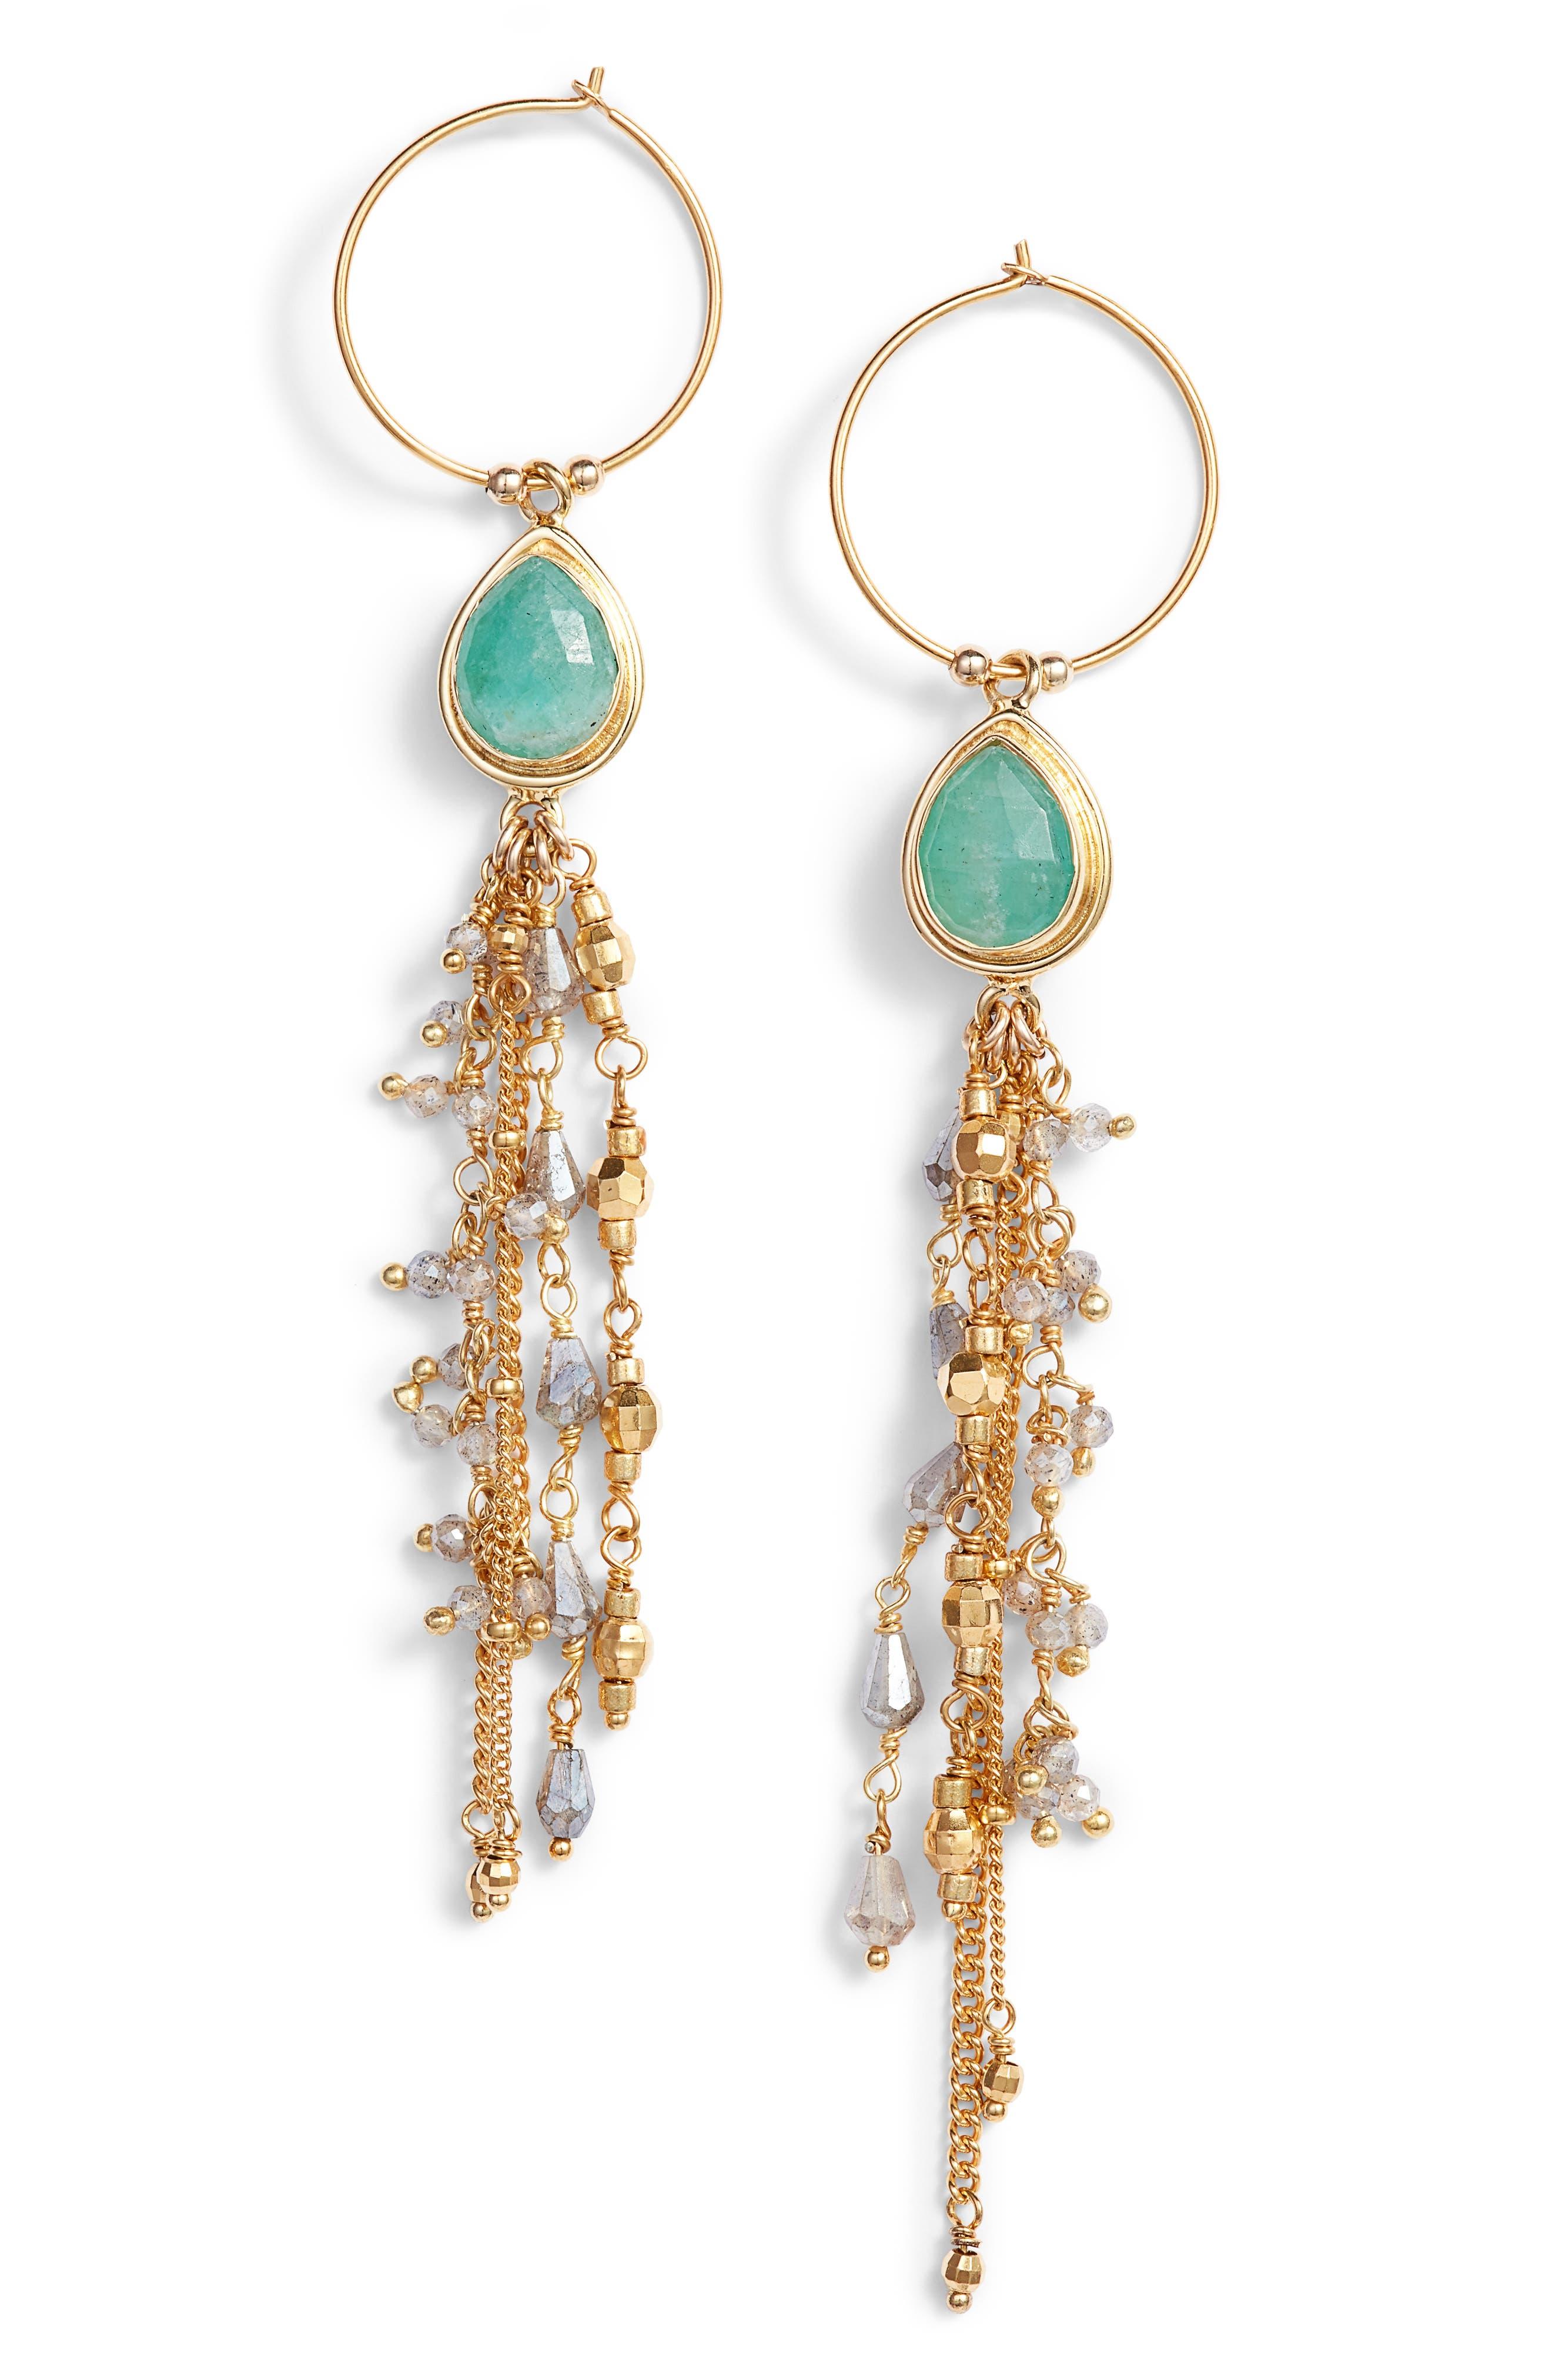 Moonstone Chain Earrings,                         Main,                         color, AMAZONITE